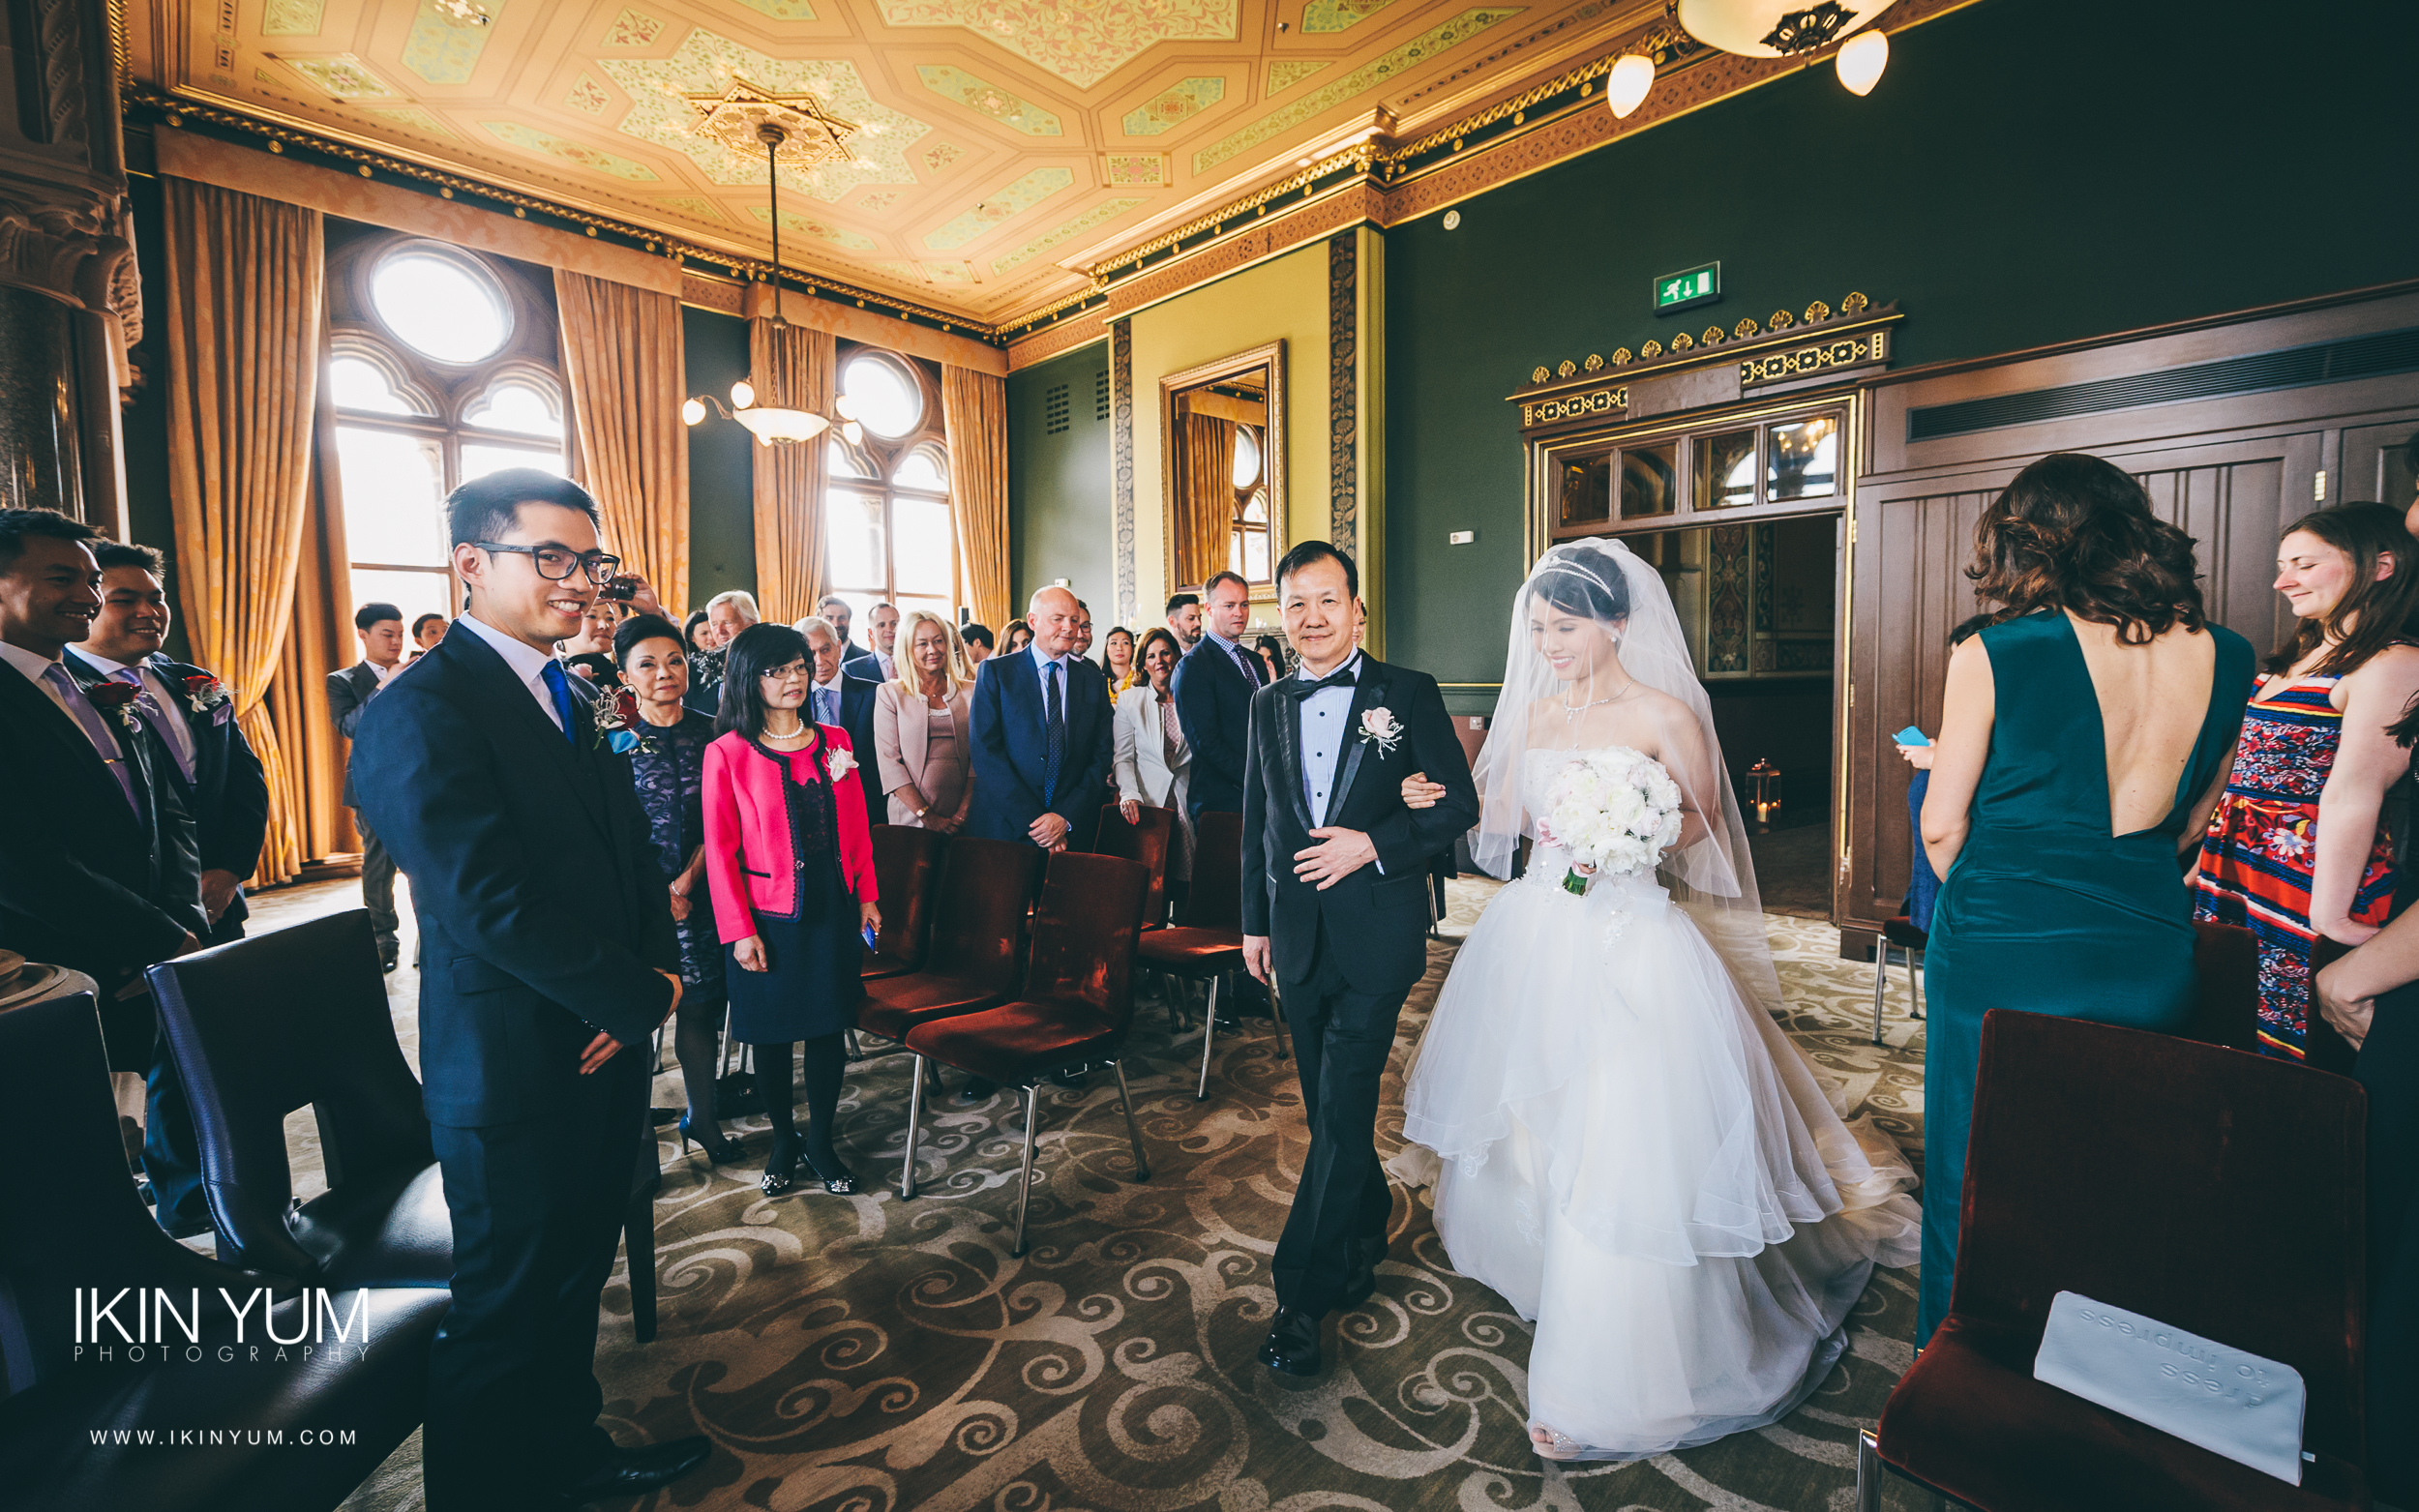 St Pancras Renaissance Hotel - Wedding - Ikin Yum Photography-079.jpg